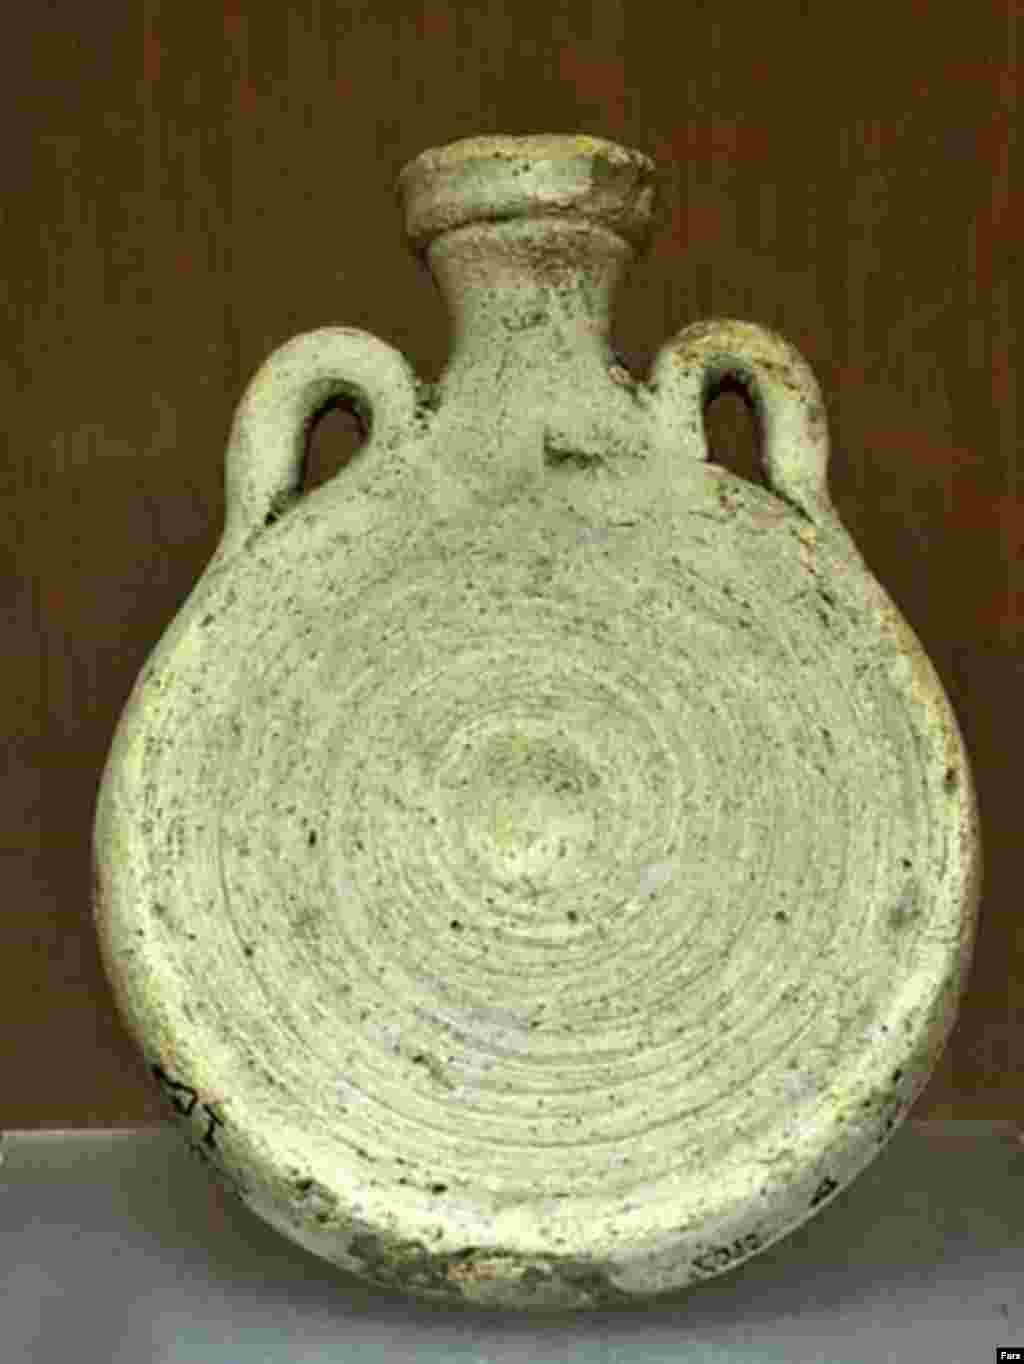 قمقمه سفالی با دو دسته عمودی متعلق به دوره ساسانی محل کشف شوش